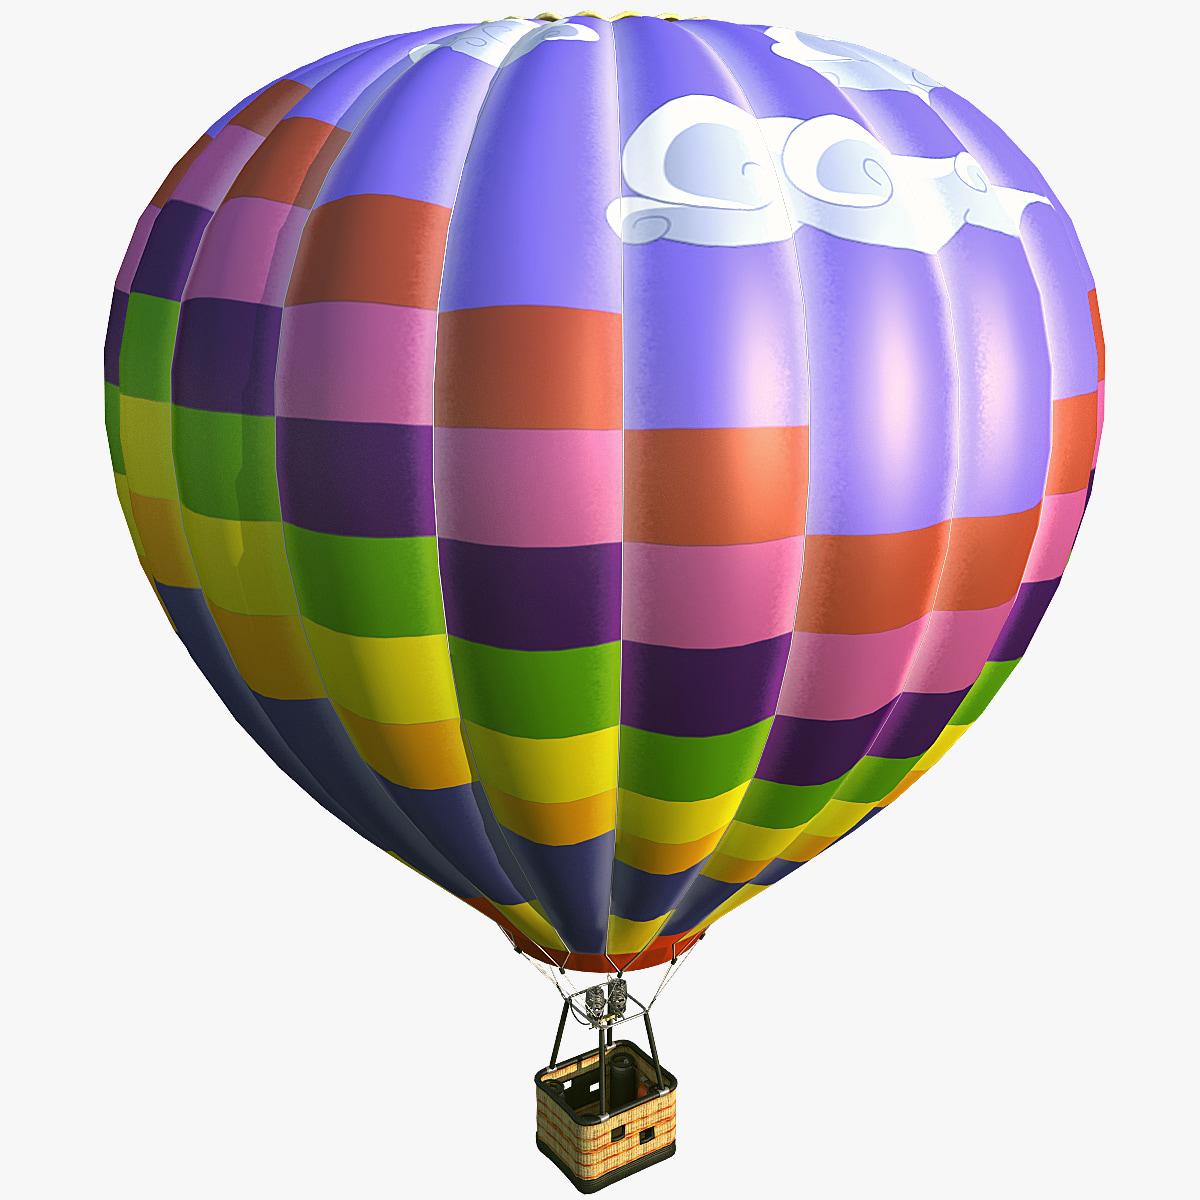 Air_Balloon_V5_Vray_0002_1.jpg